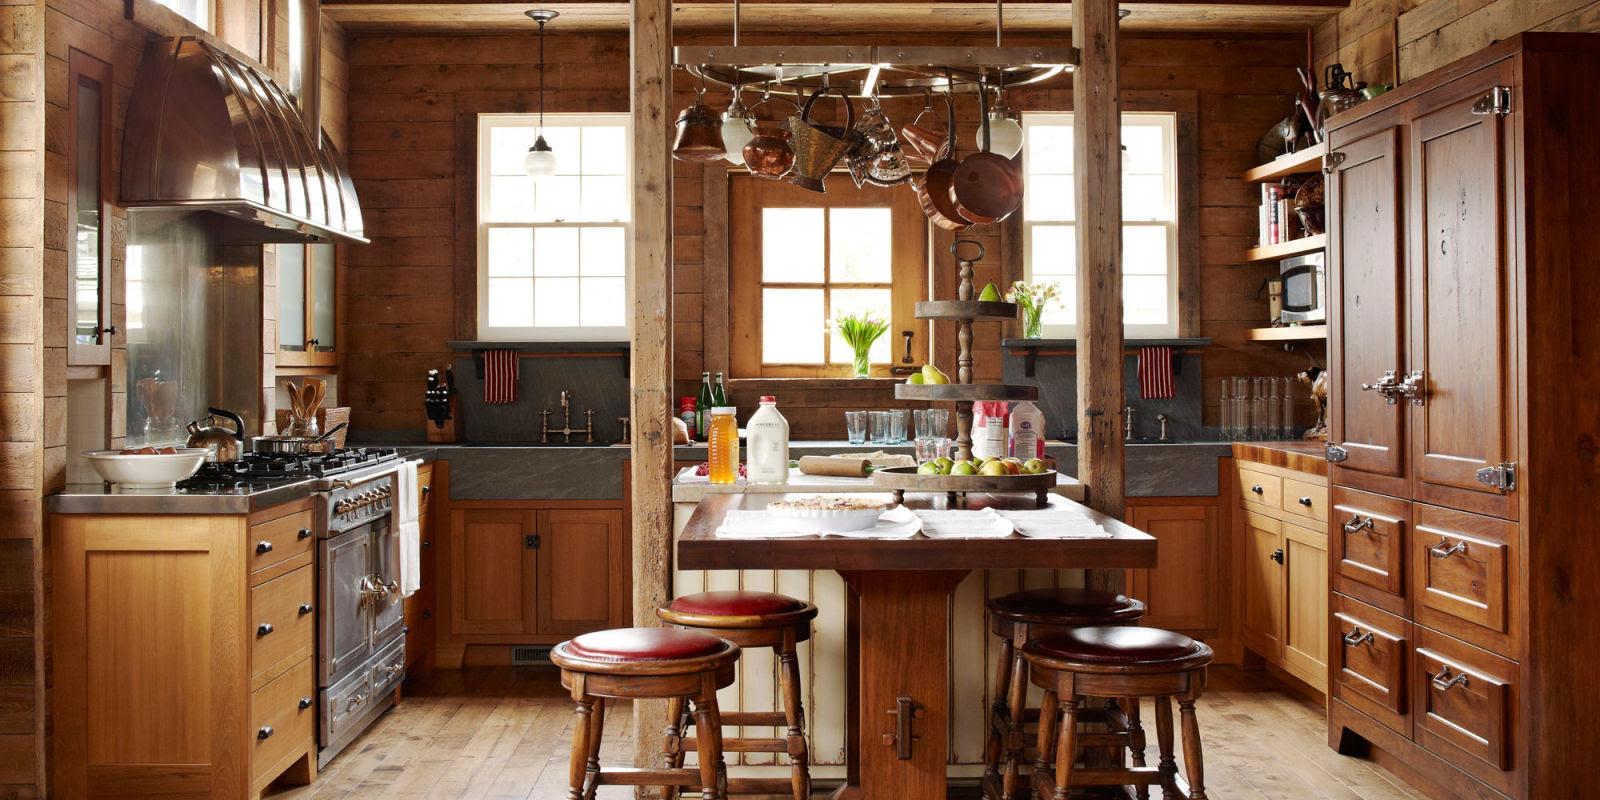 The Stylish and Simplest Kitchen Remodeling Ways - Amaza ...